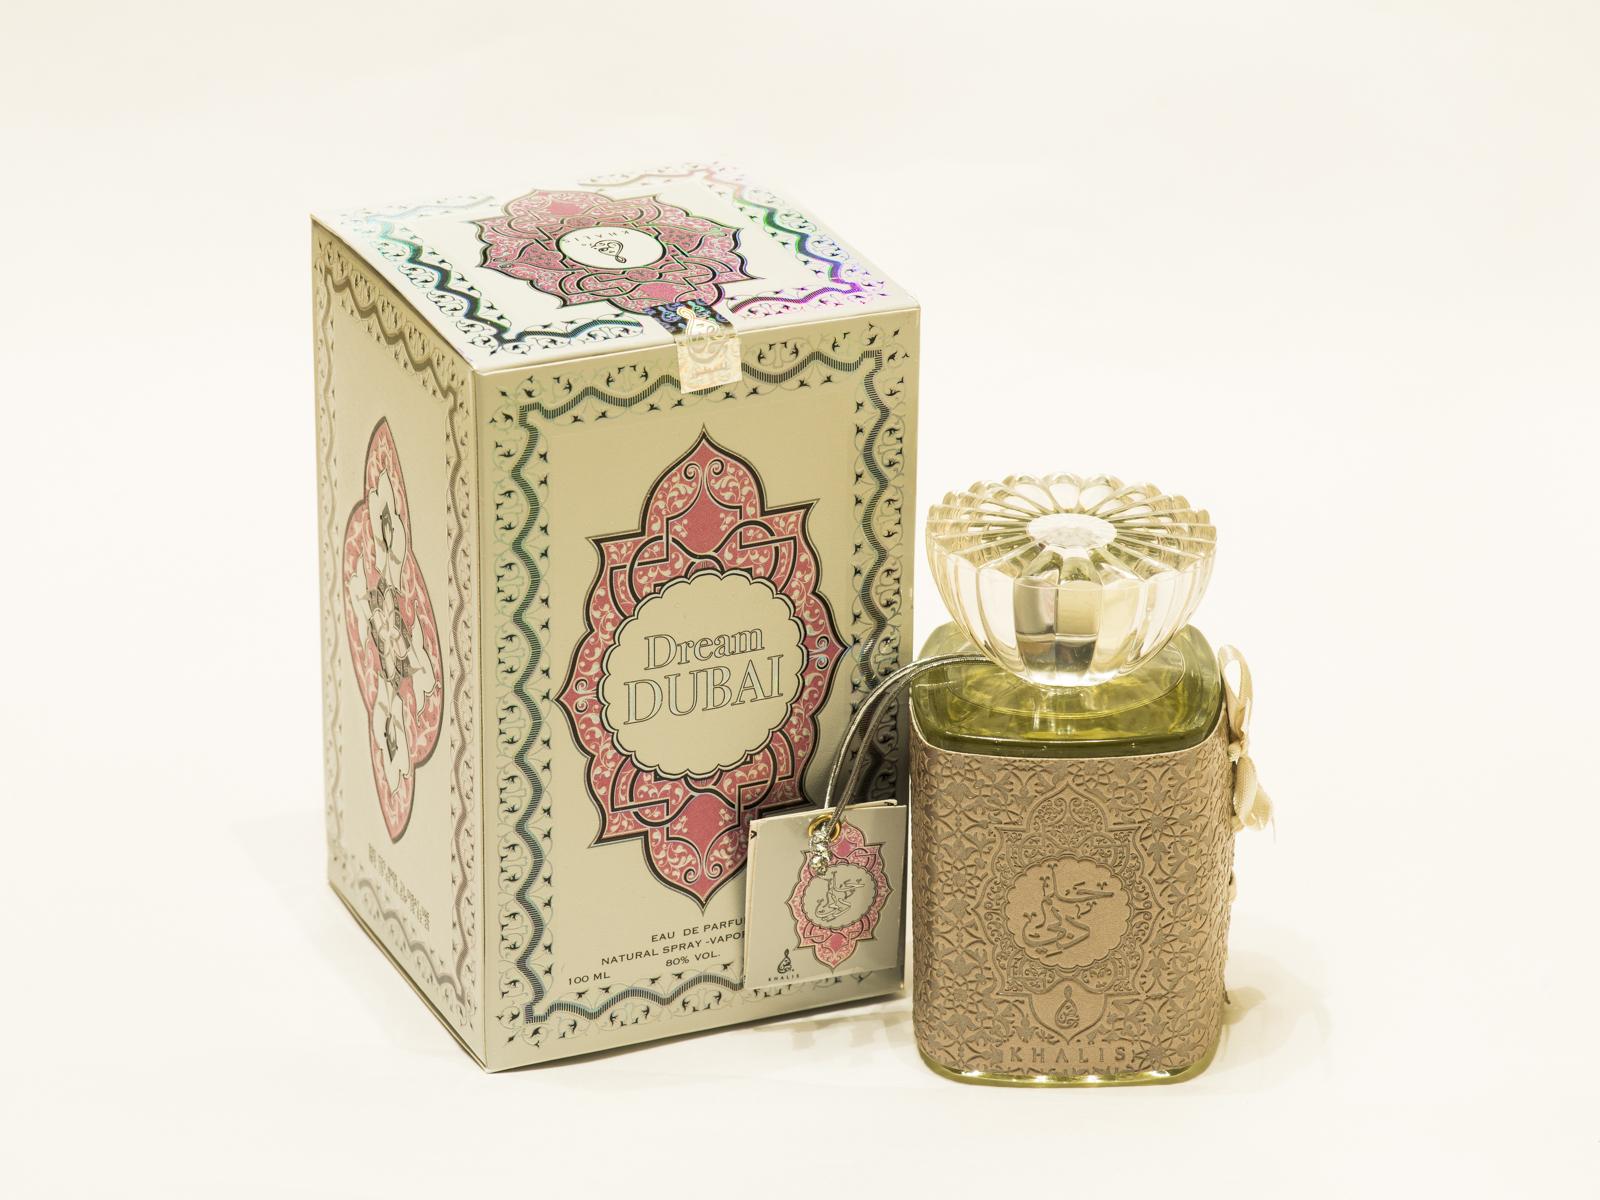 Пробник Dream Dubai / Мечта Дубай (бывшая Дарси Darcy) 1 мл спрей от Халис Khalis Perfumes